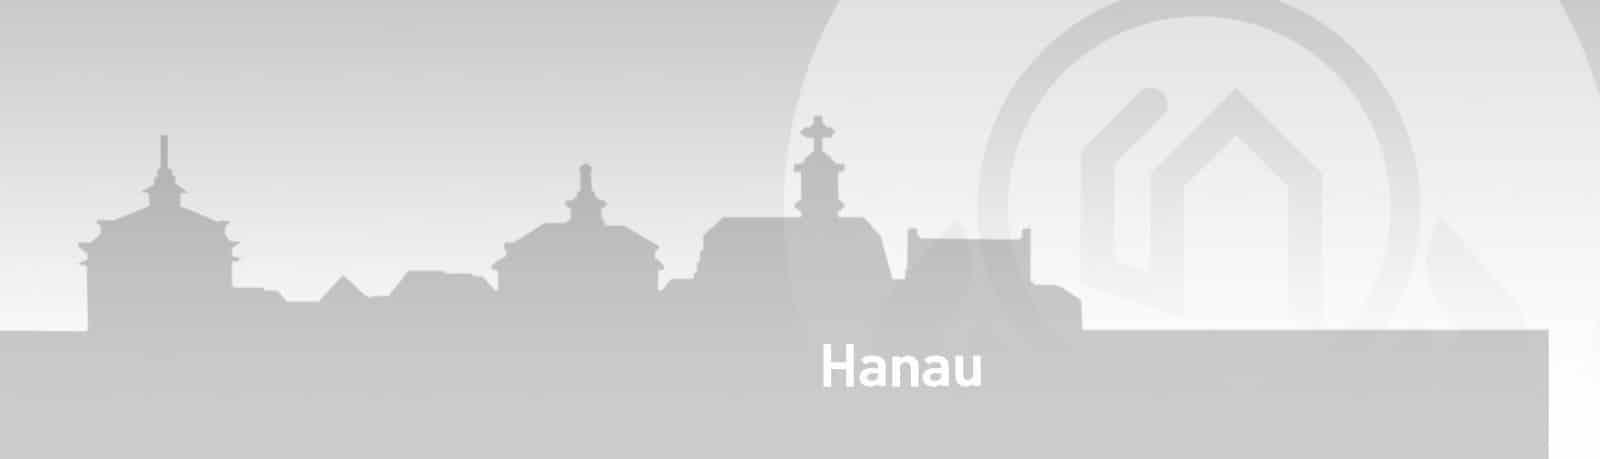 Hanau SENCURINA 1904x546 - Hanau